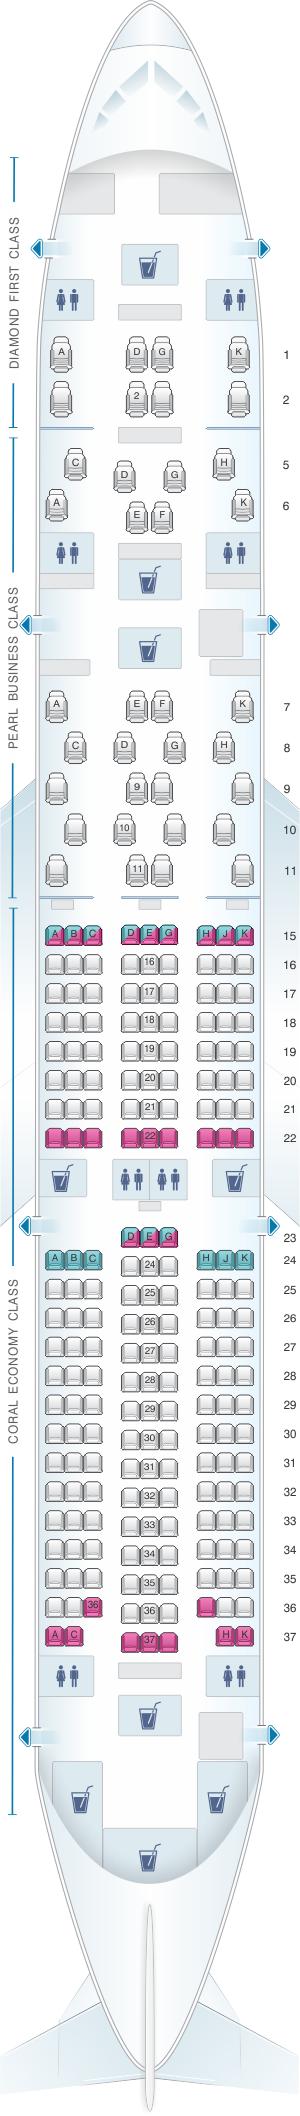 Seat map for Etihad Airways Boeing B787 9 three class